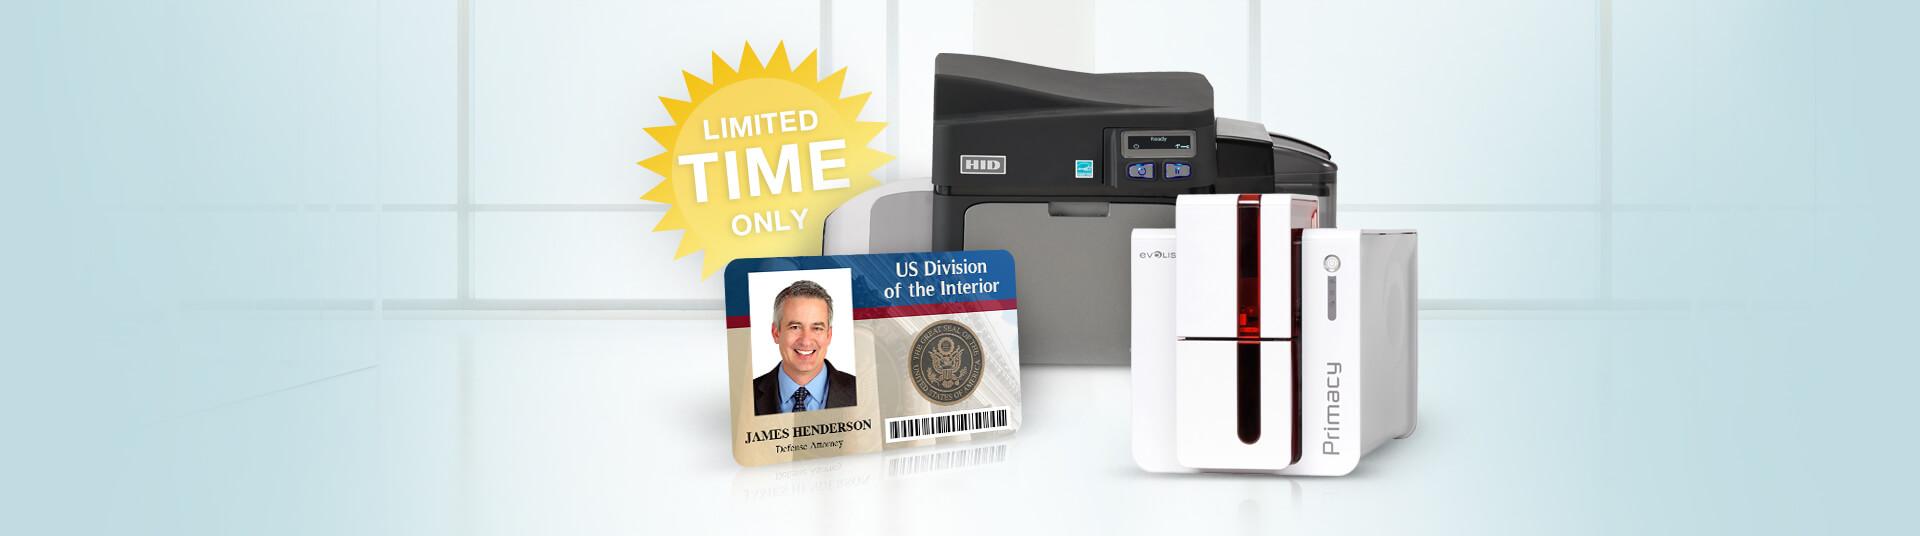 ID Card Printer Rebate Offers